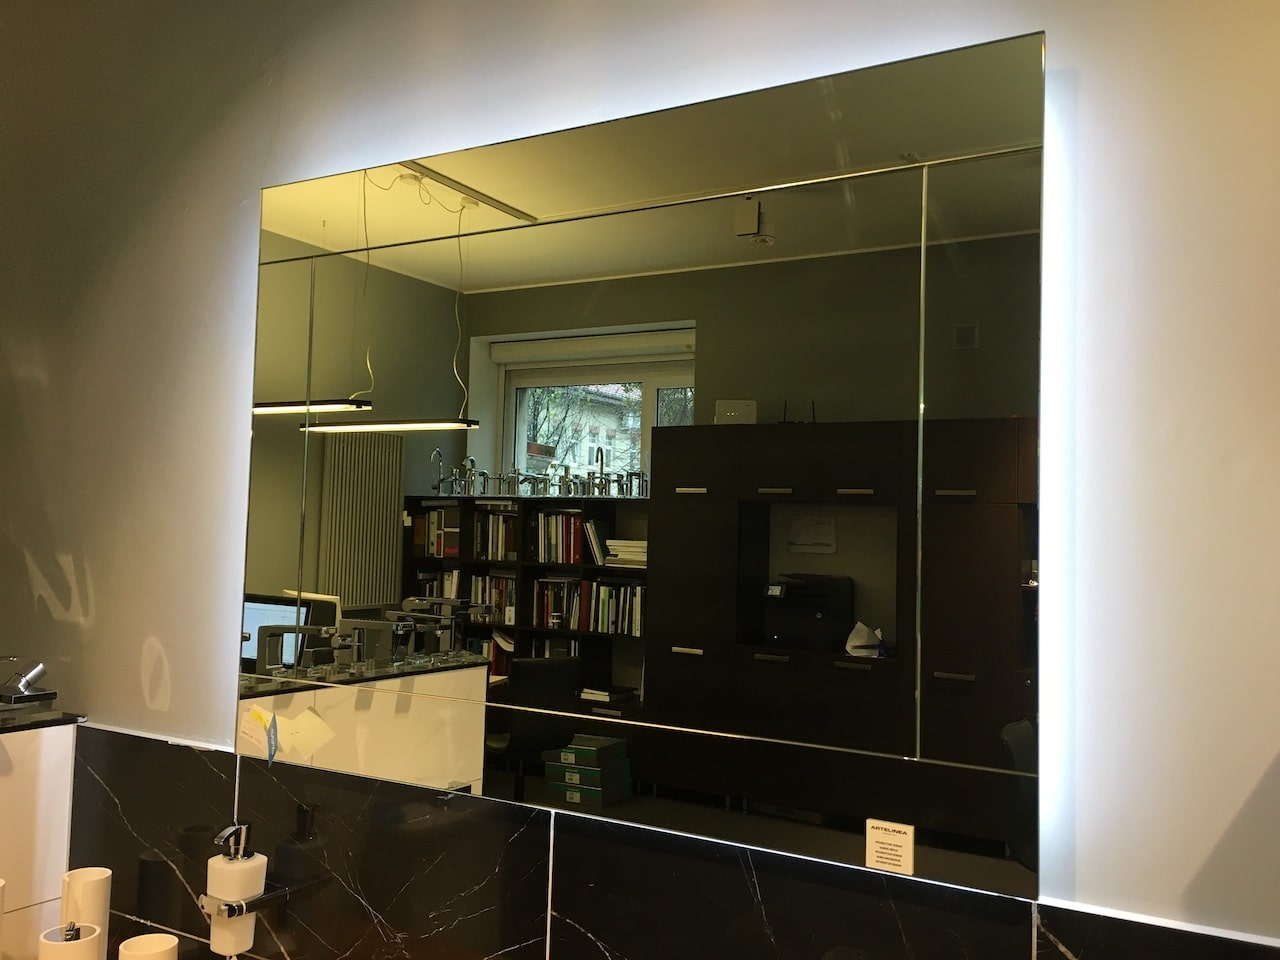 Смена экспозиции в салонах Sanilux и Sanilux home